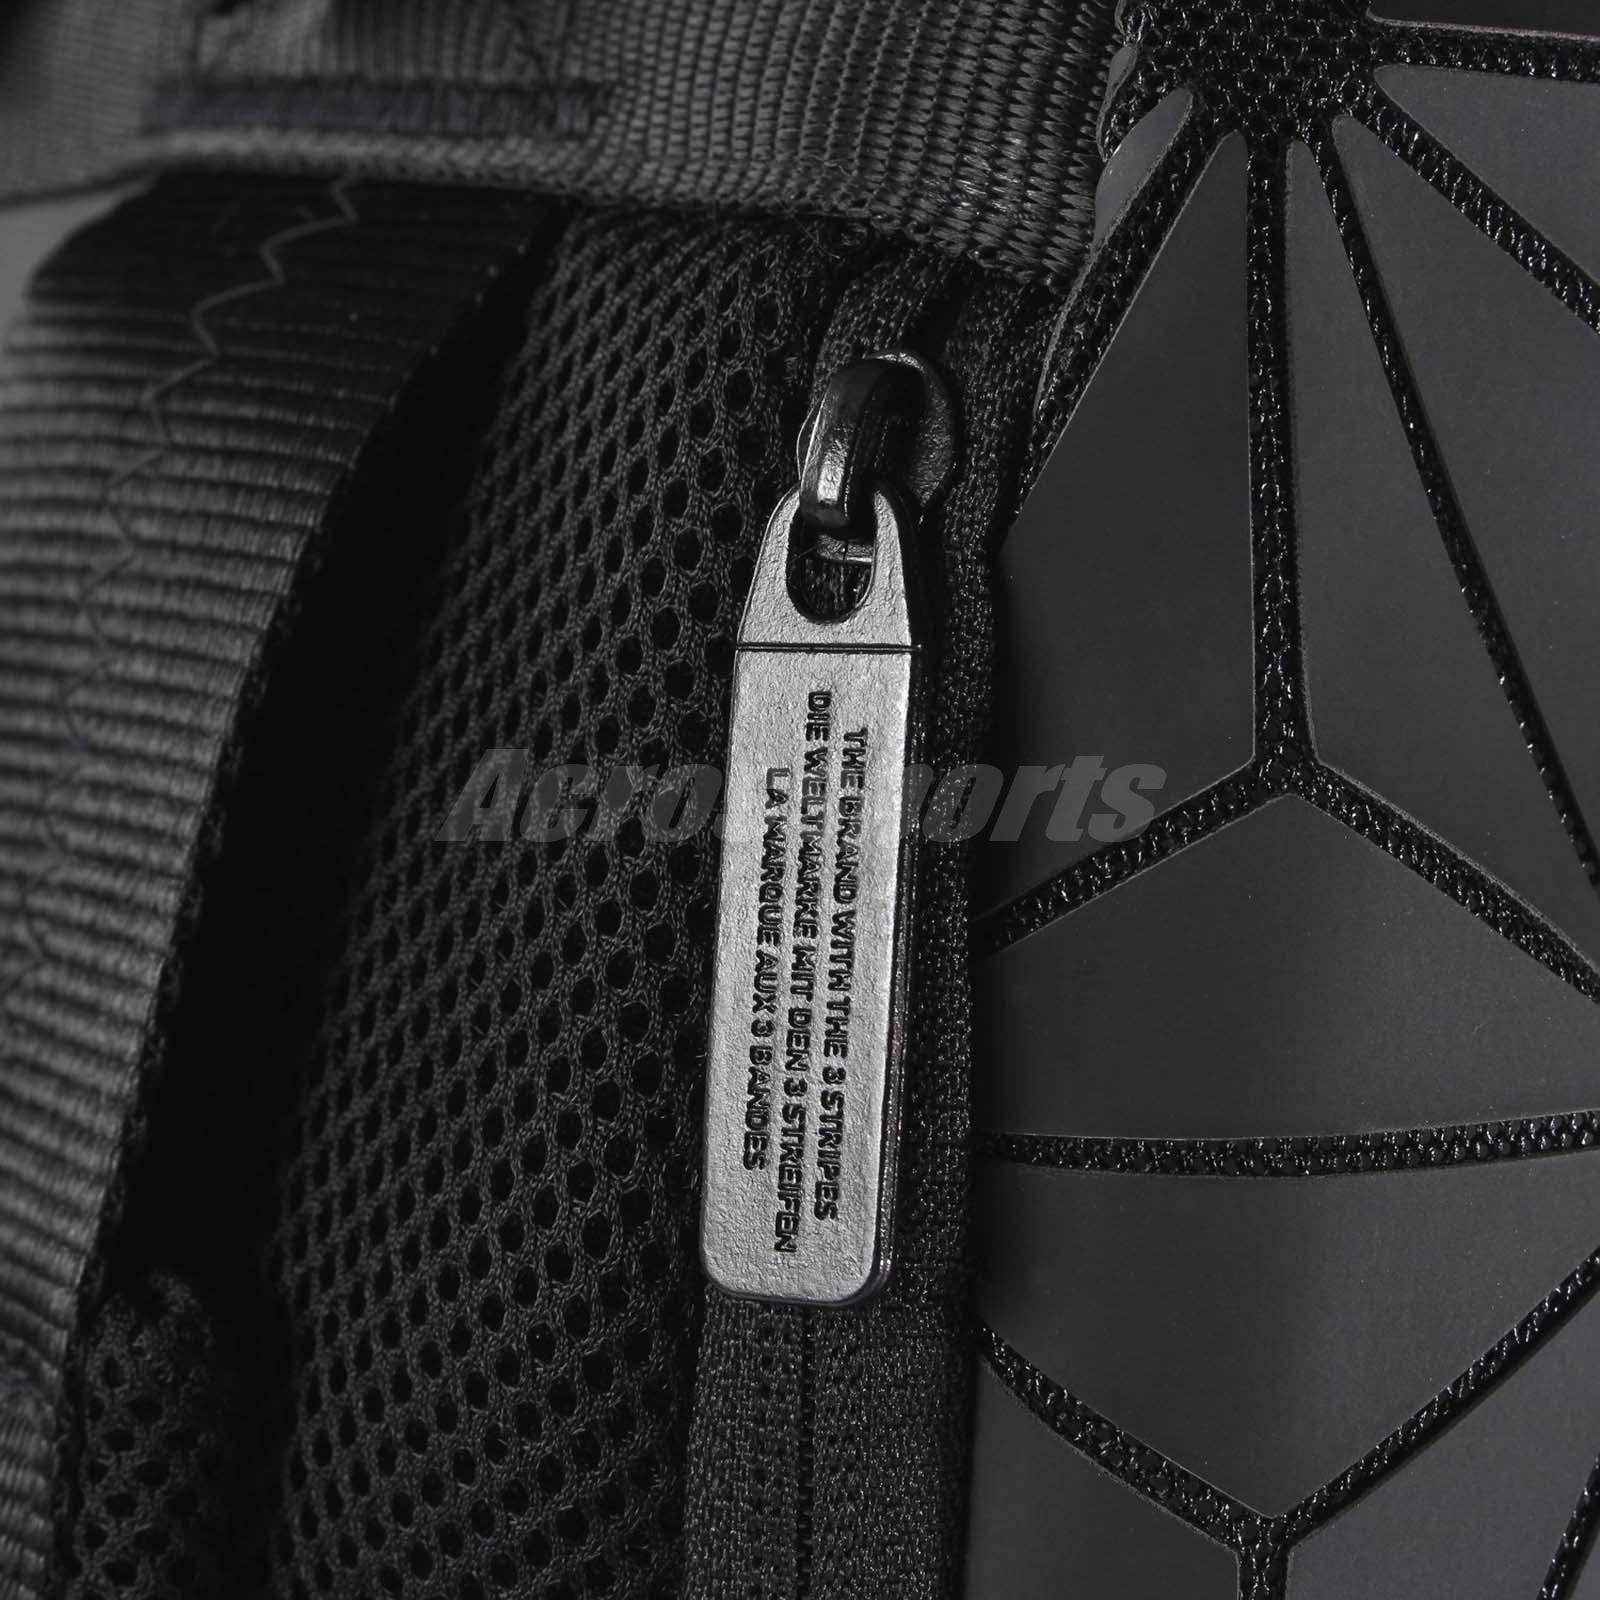 e62a8dd948 adidas Originals BP Roll Top 3D Mesh 2017 Black White Backpack Bag ...